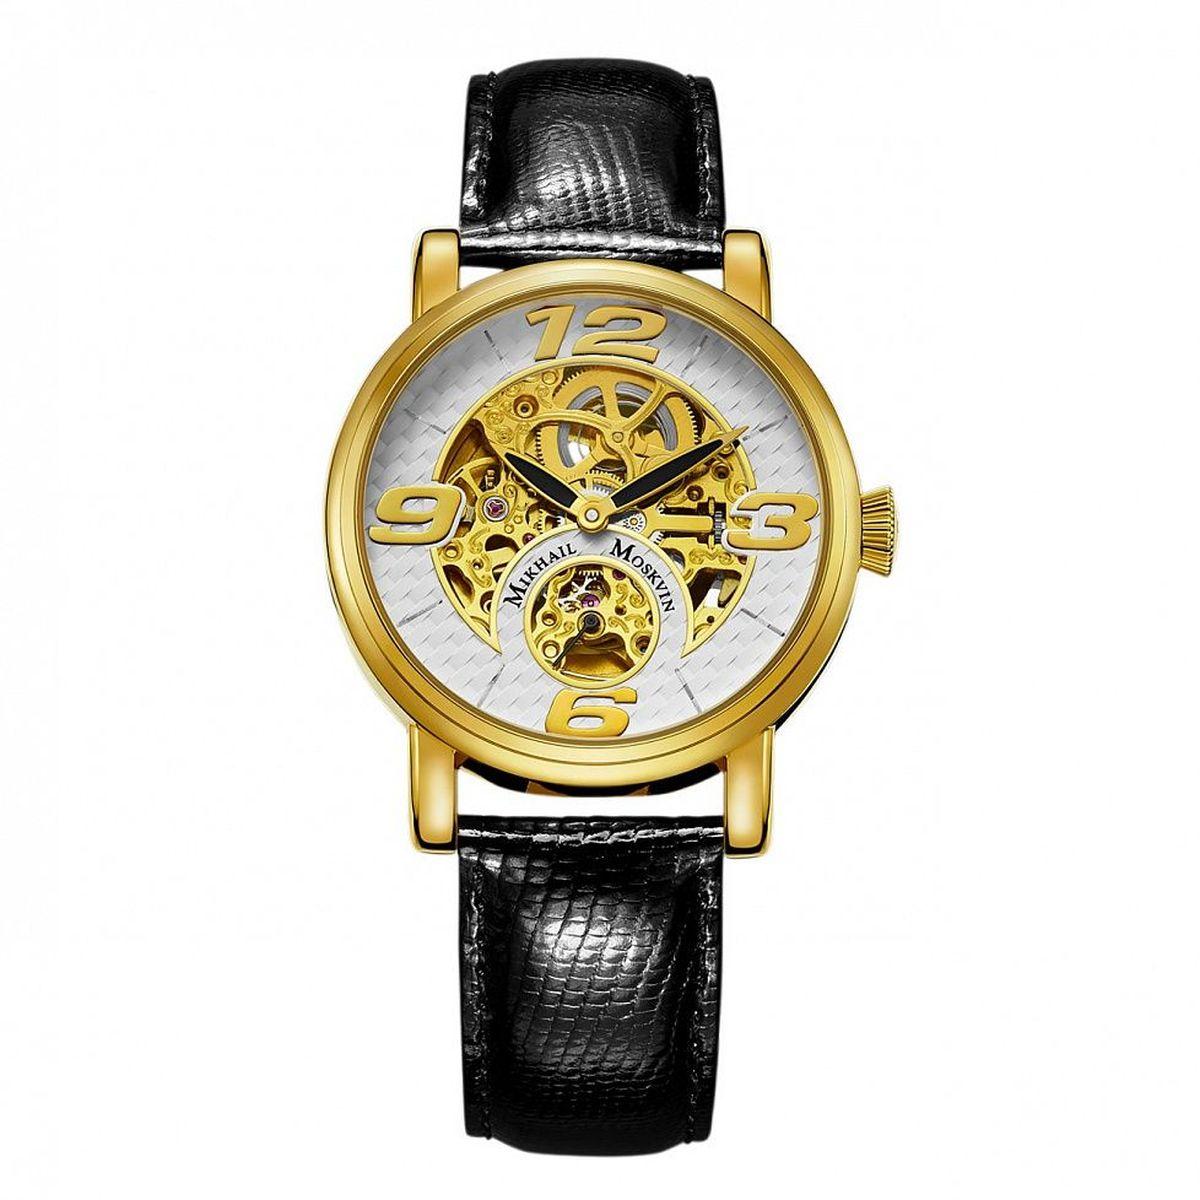 Zakazat.ru Часы наручные мужские Mikhail Moskvin Премьер, цвет: золотой, черный. 1233A2L2